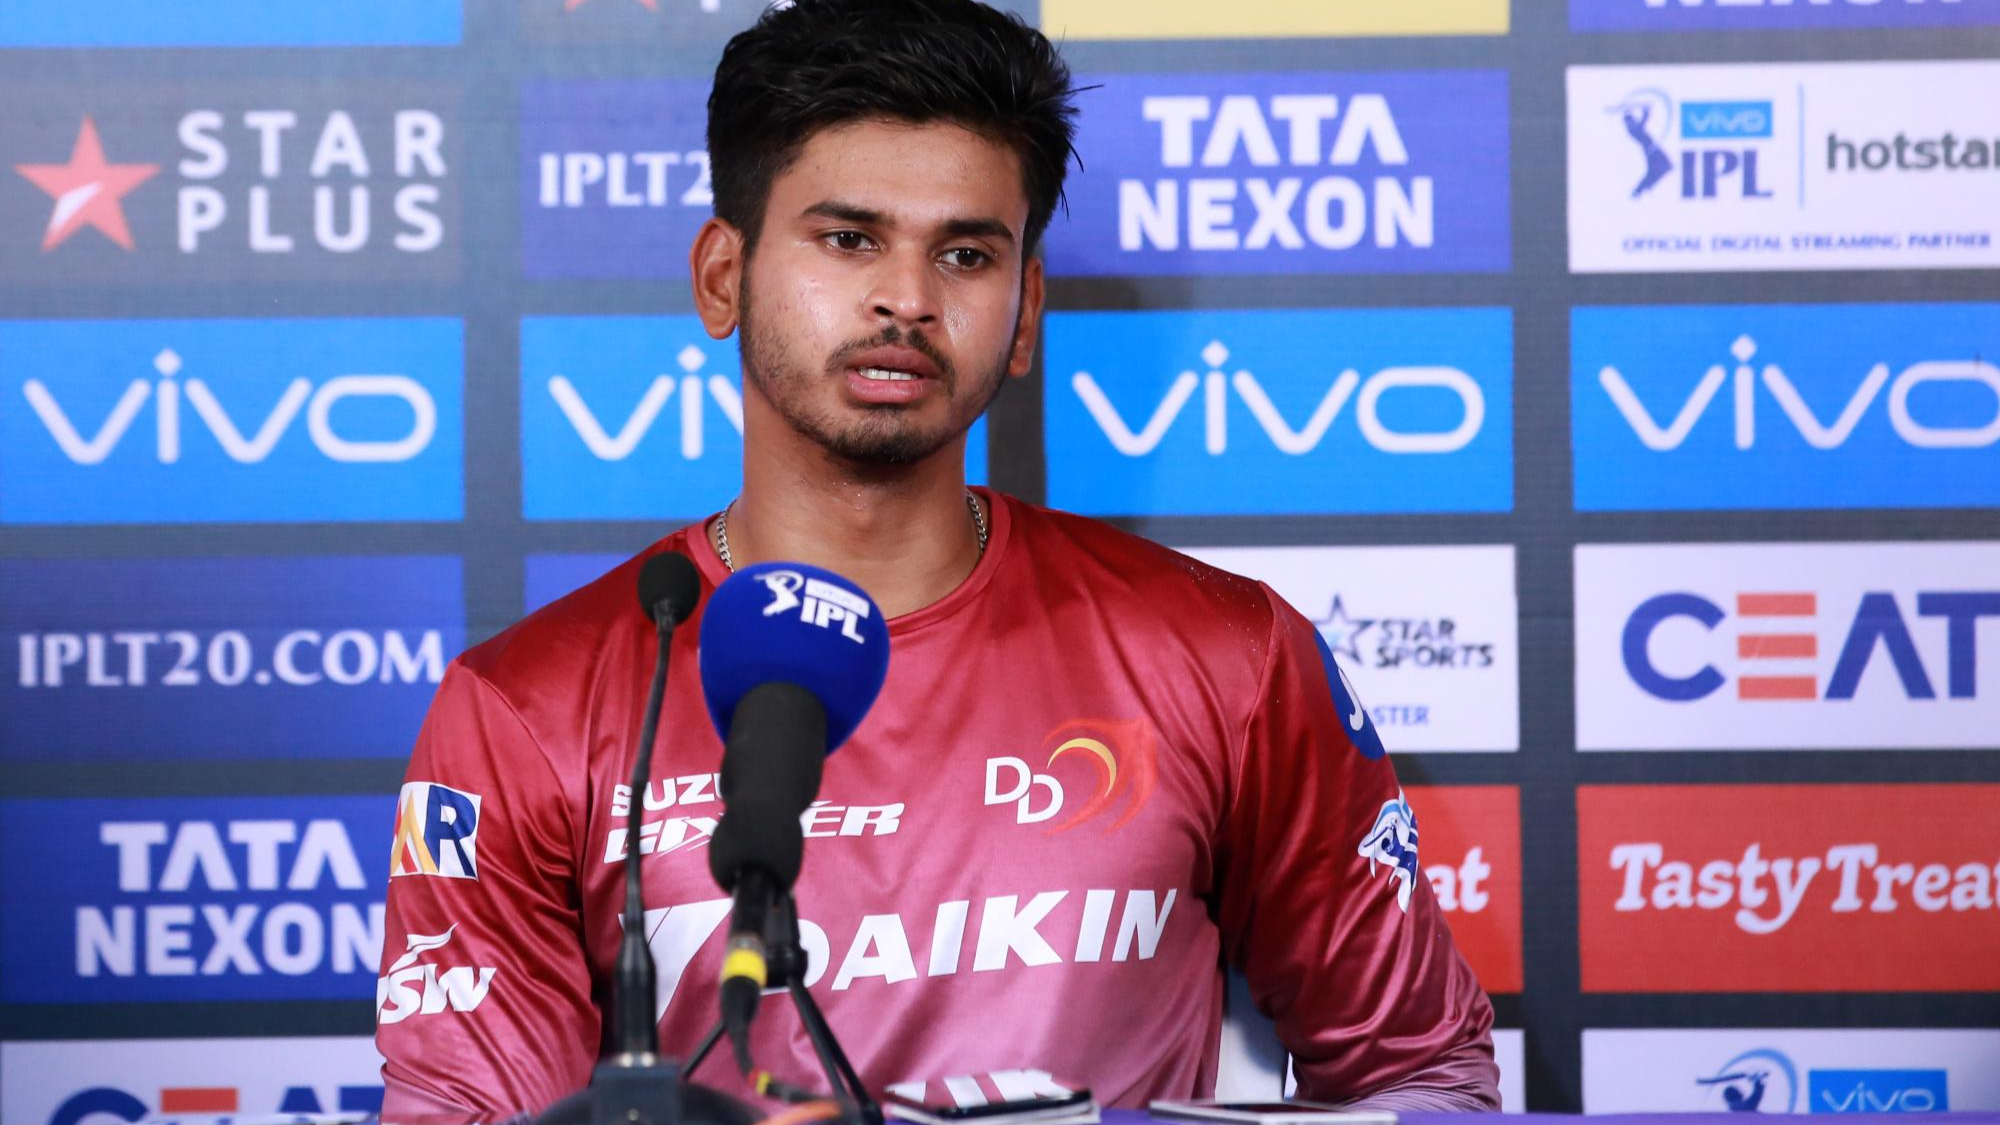 IPL 2018: Shreyas Iyer distraught after Delhi Daredevils' heartbreaking loss to SRH